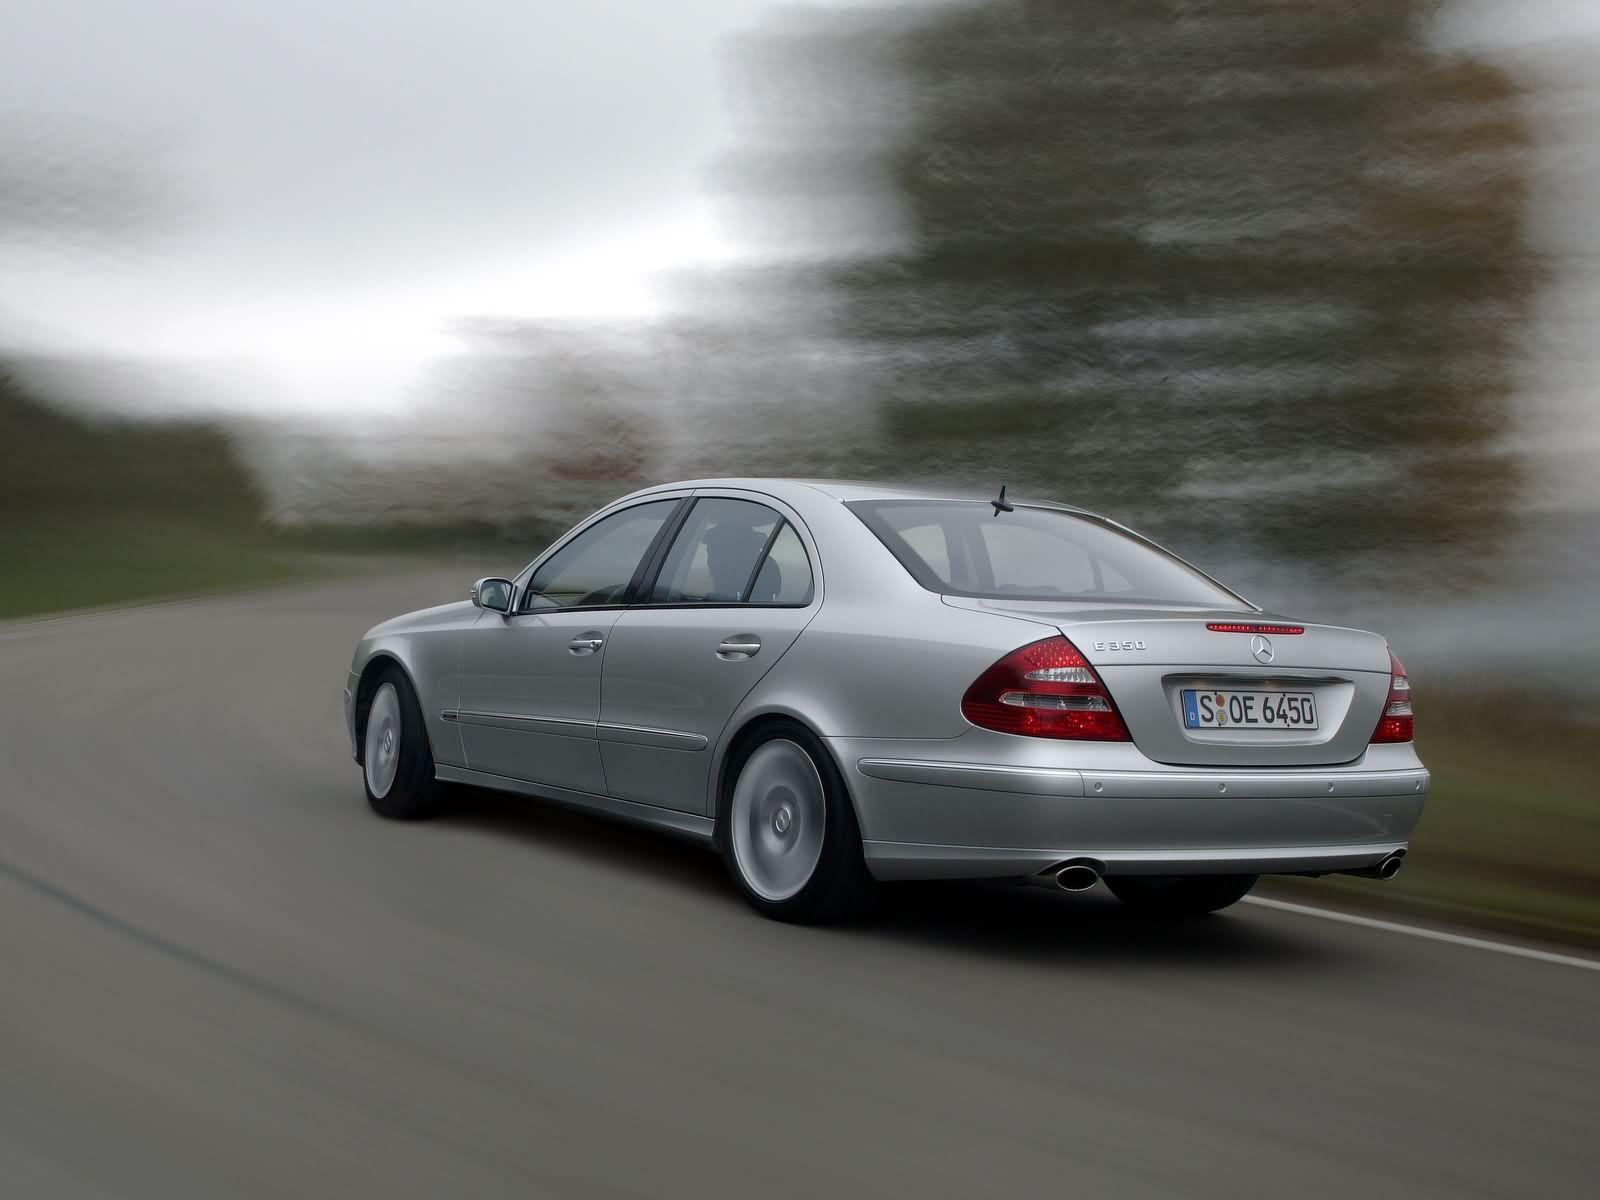 Mercedes benz e class w211 picture 17109 mercedes benz for Mercedes benz w211